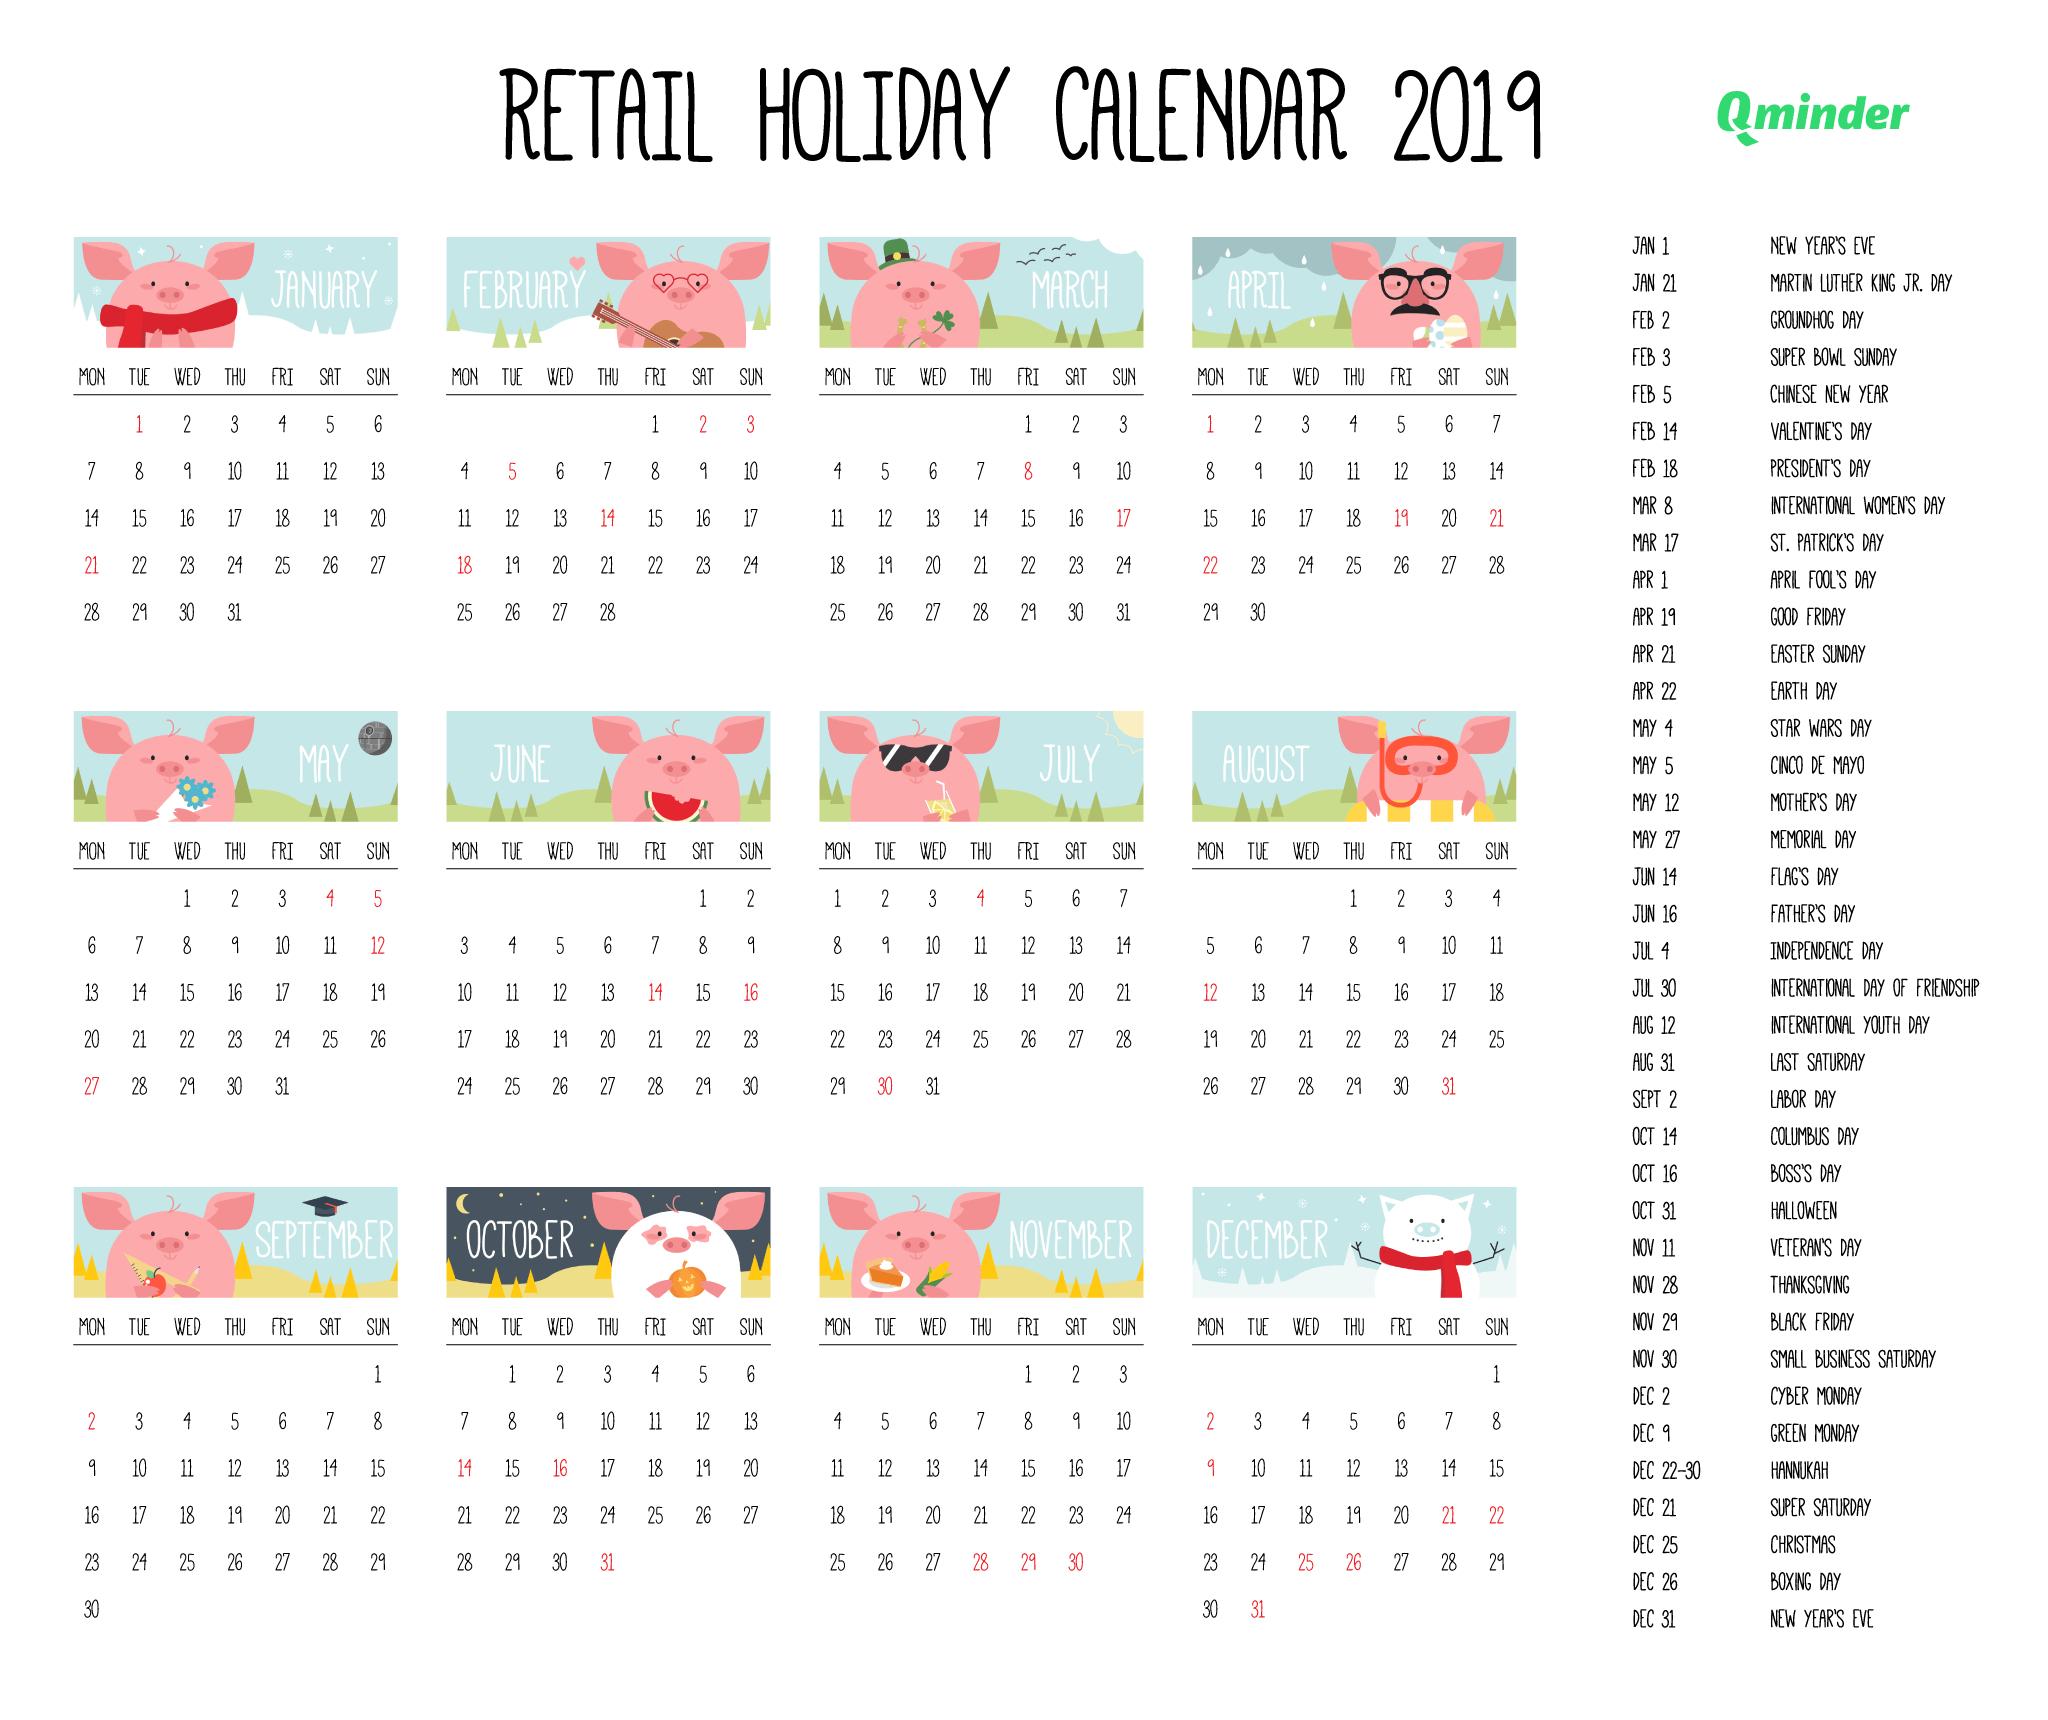 2019 Retail Holiday Calendar | Qminder Calendar 2019 All Holidays